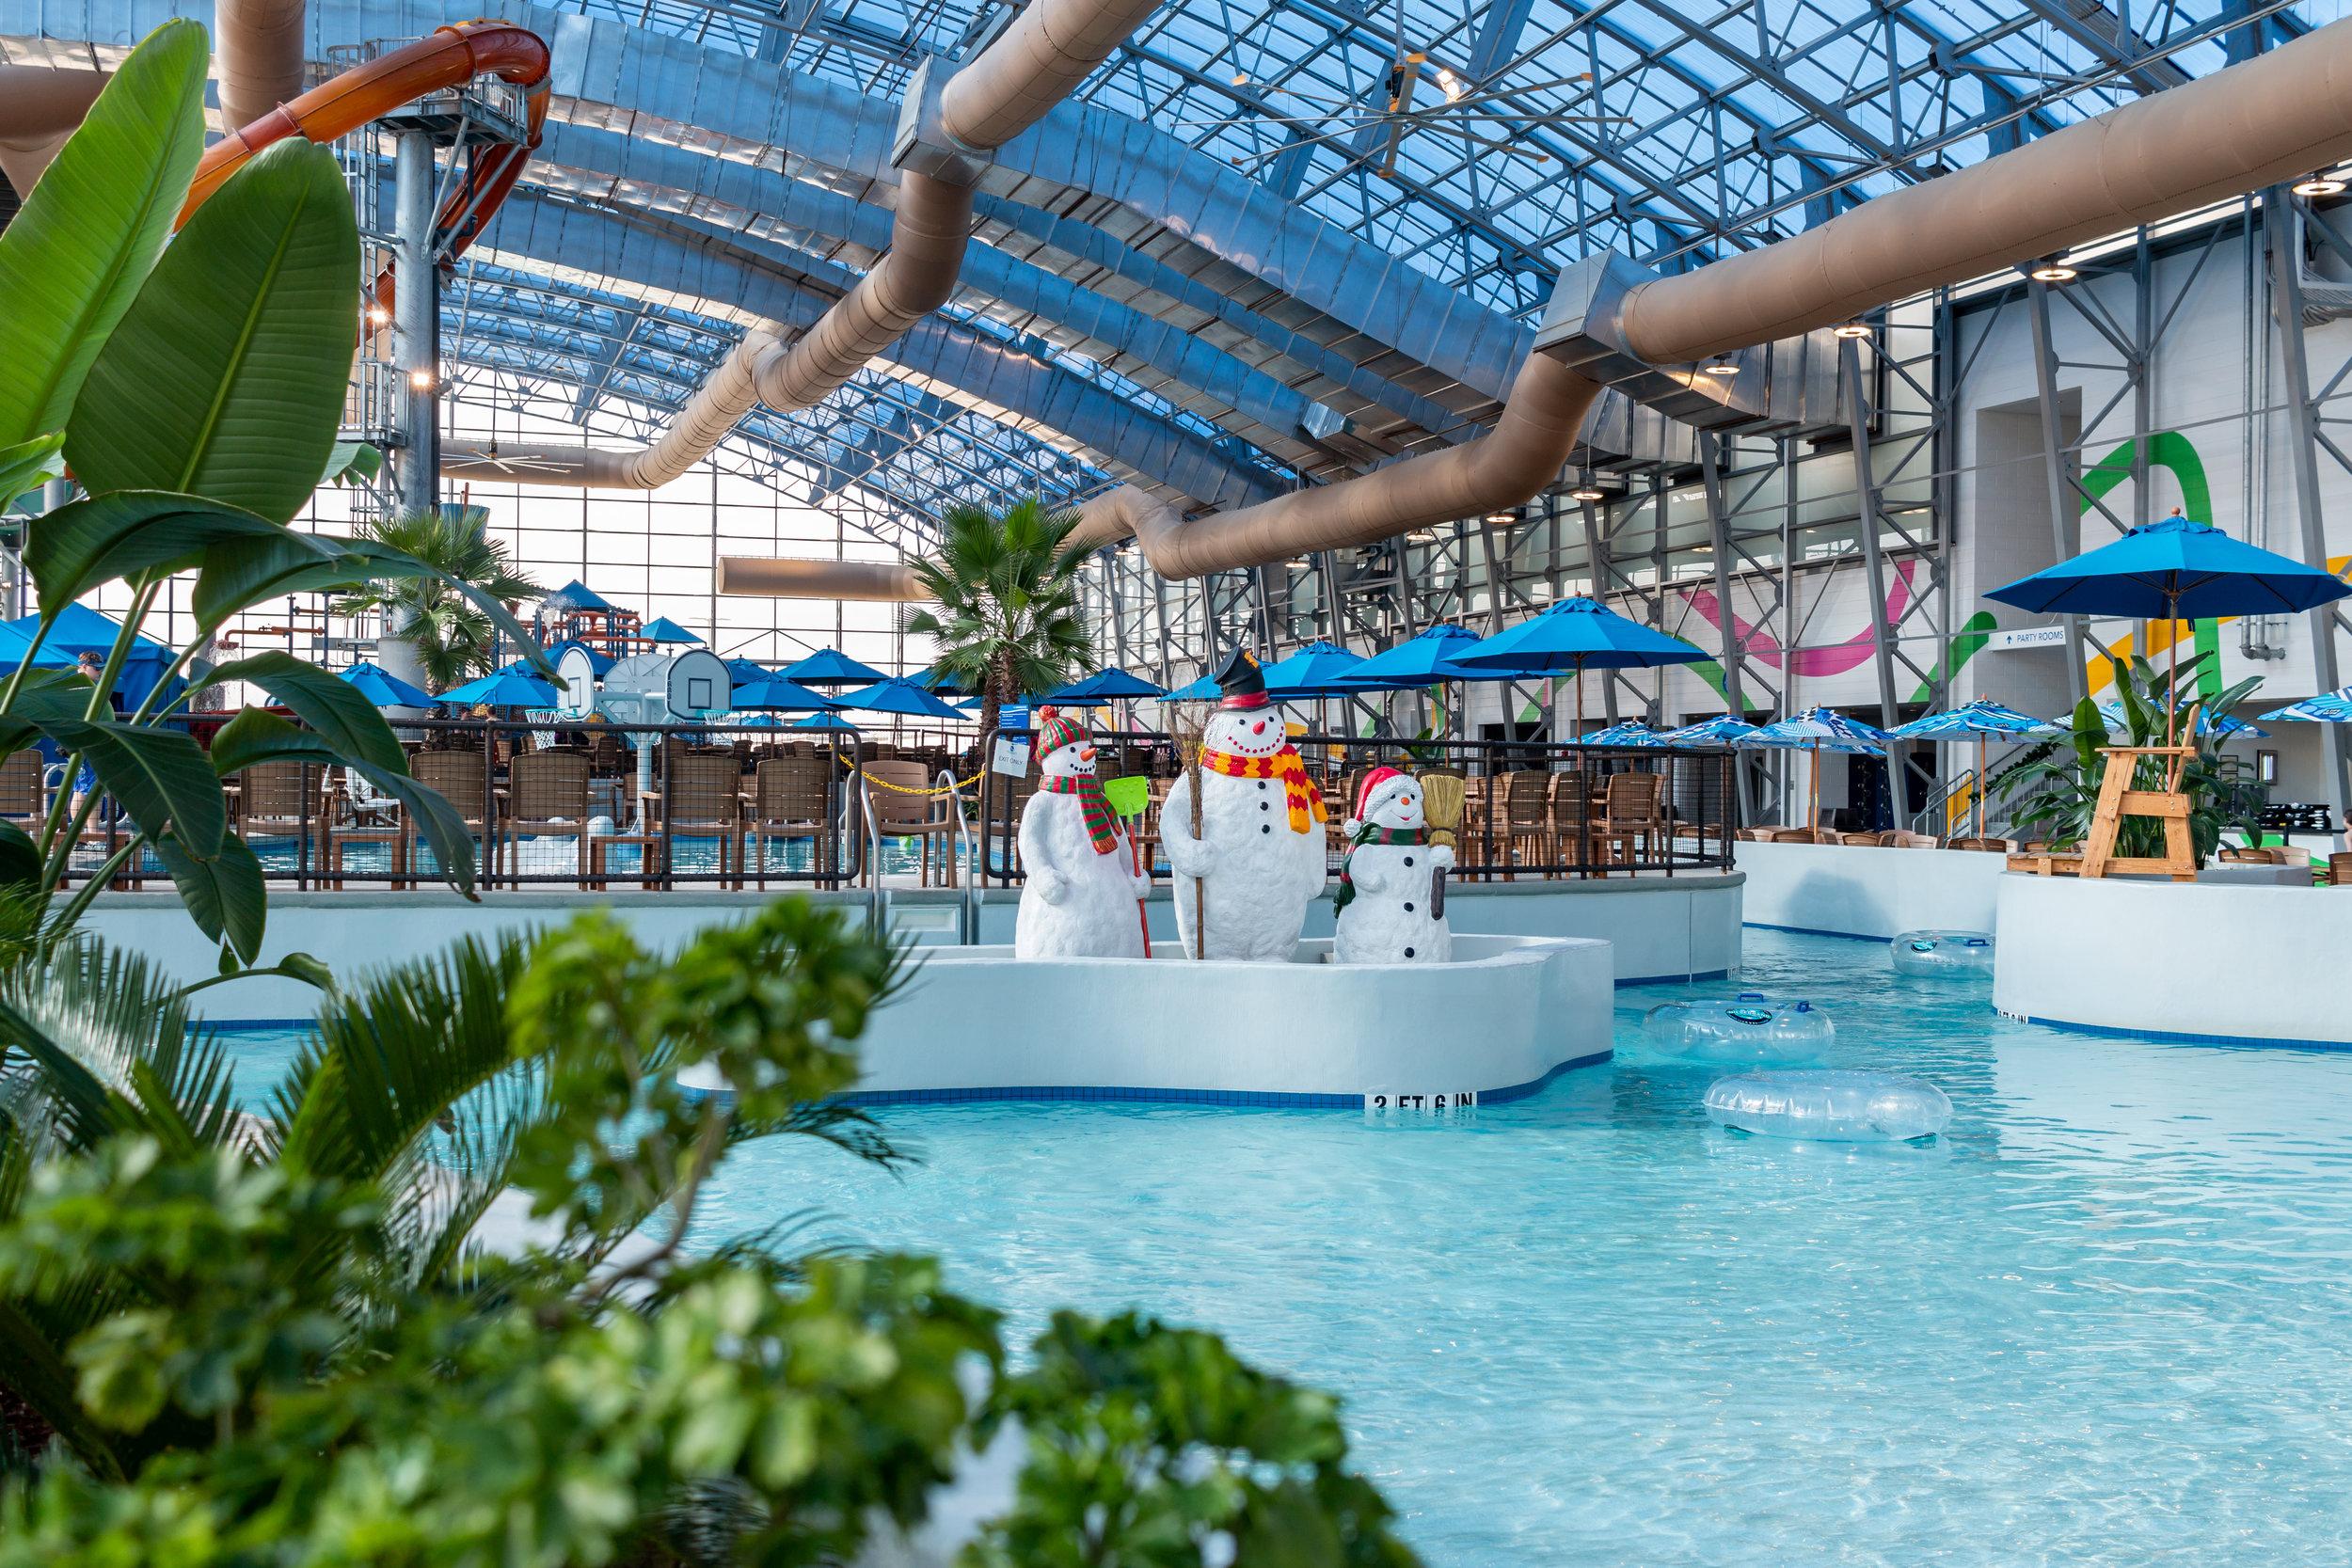 epic-waters-grand-praire-winter-summer-shot-pool